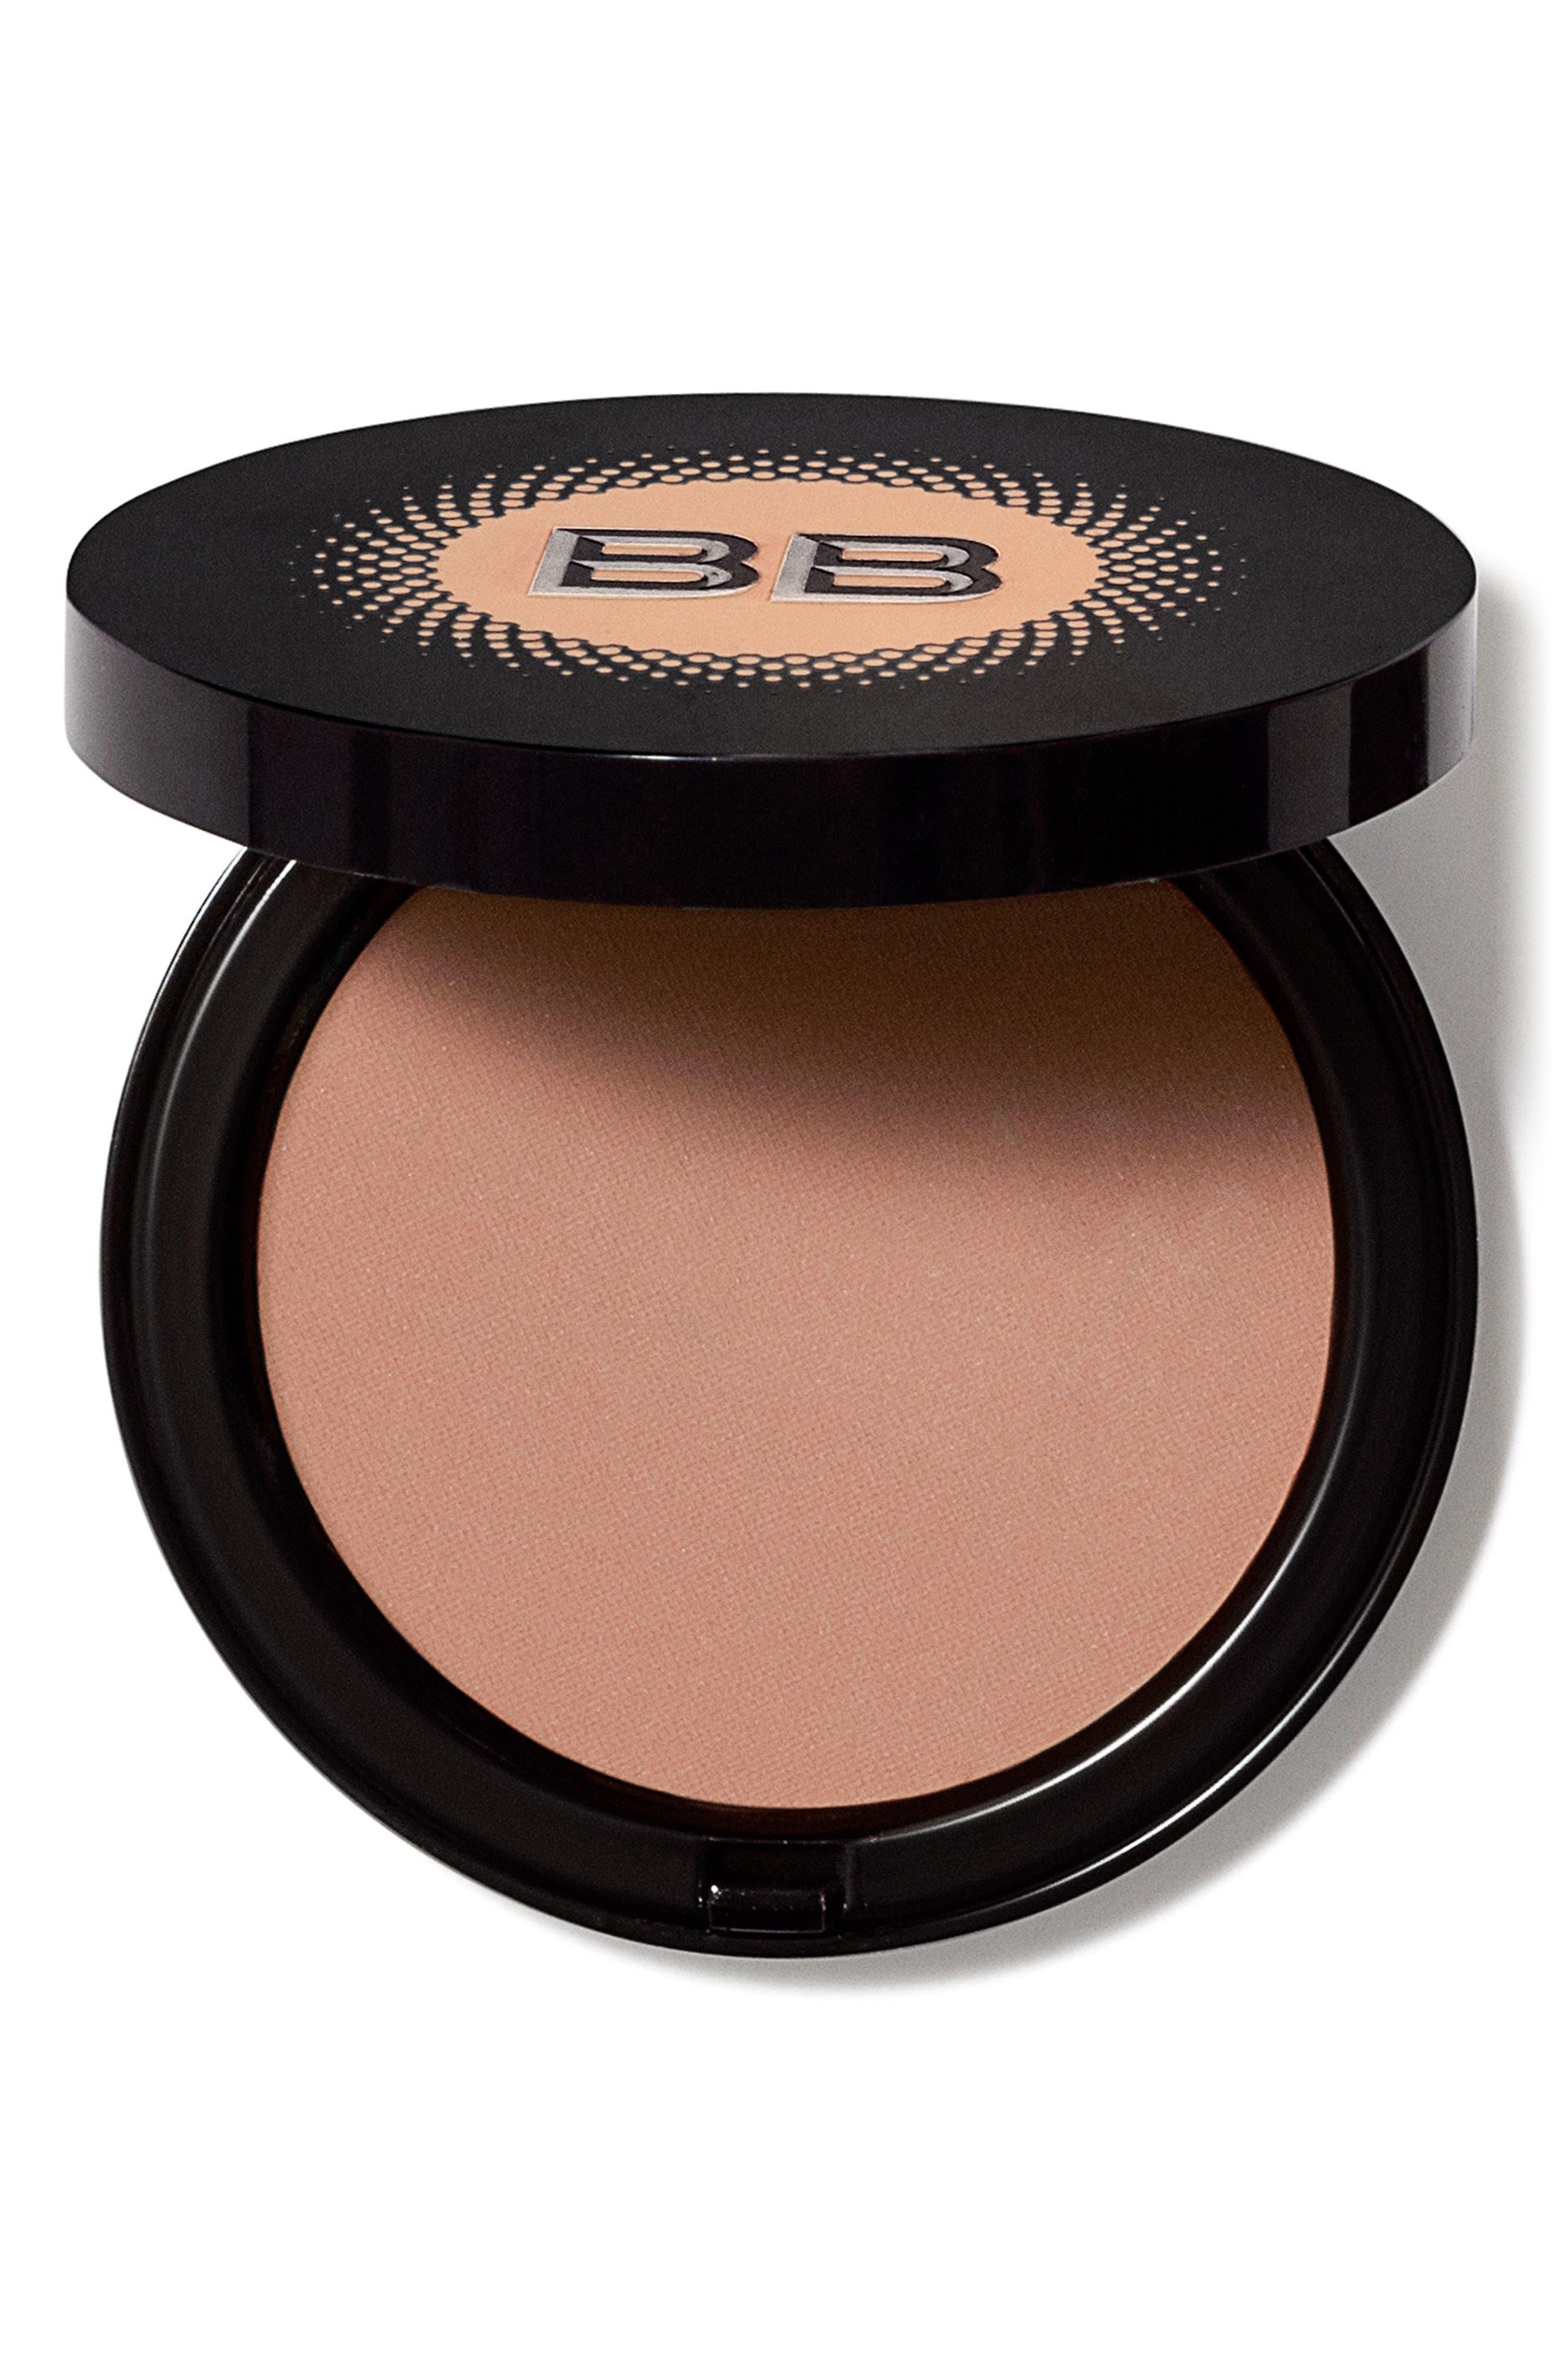 Bobbi Brown Bronzing Powder (Limited Edition)